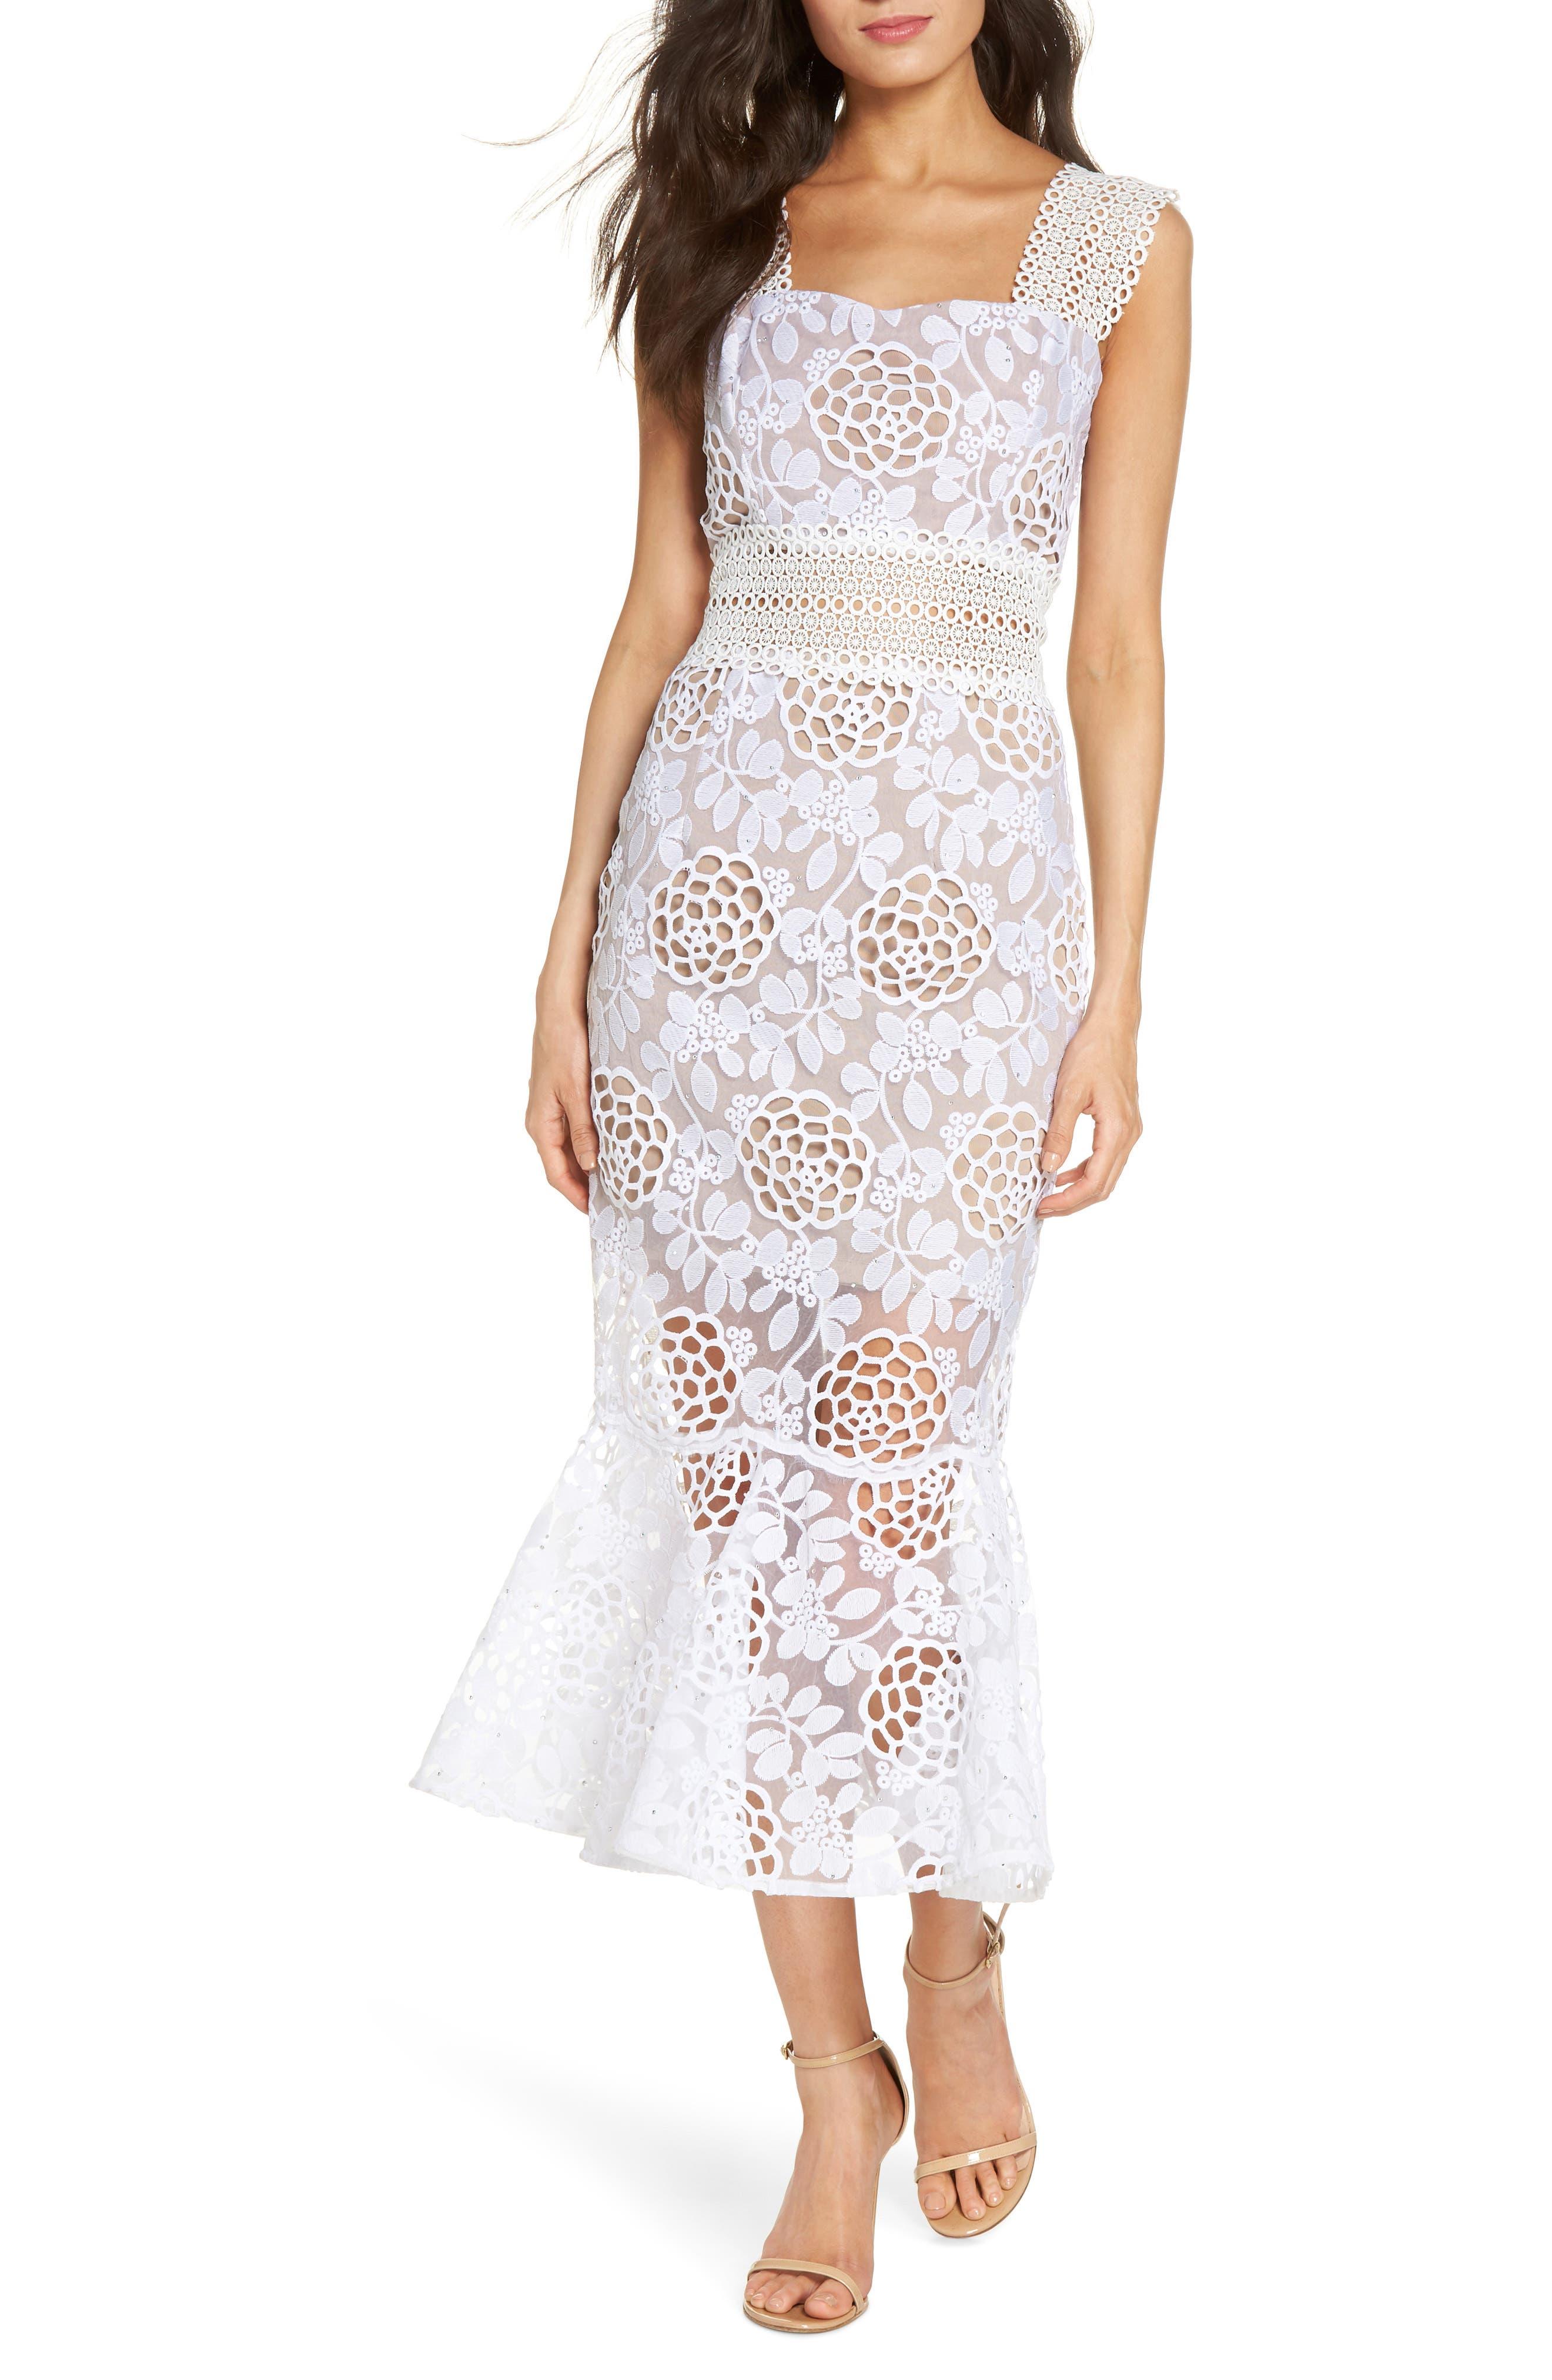 Capri Floral Lace Midi Dress,                         Main,                         color, White